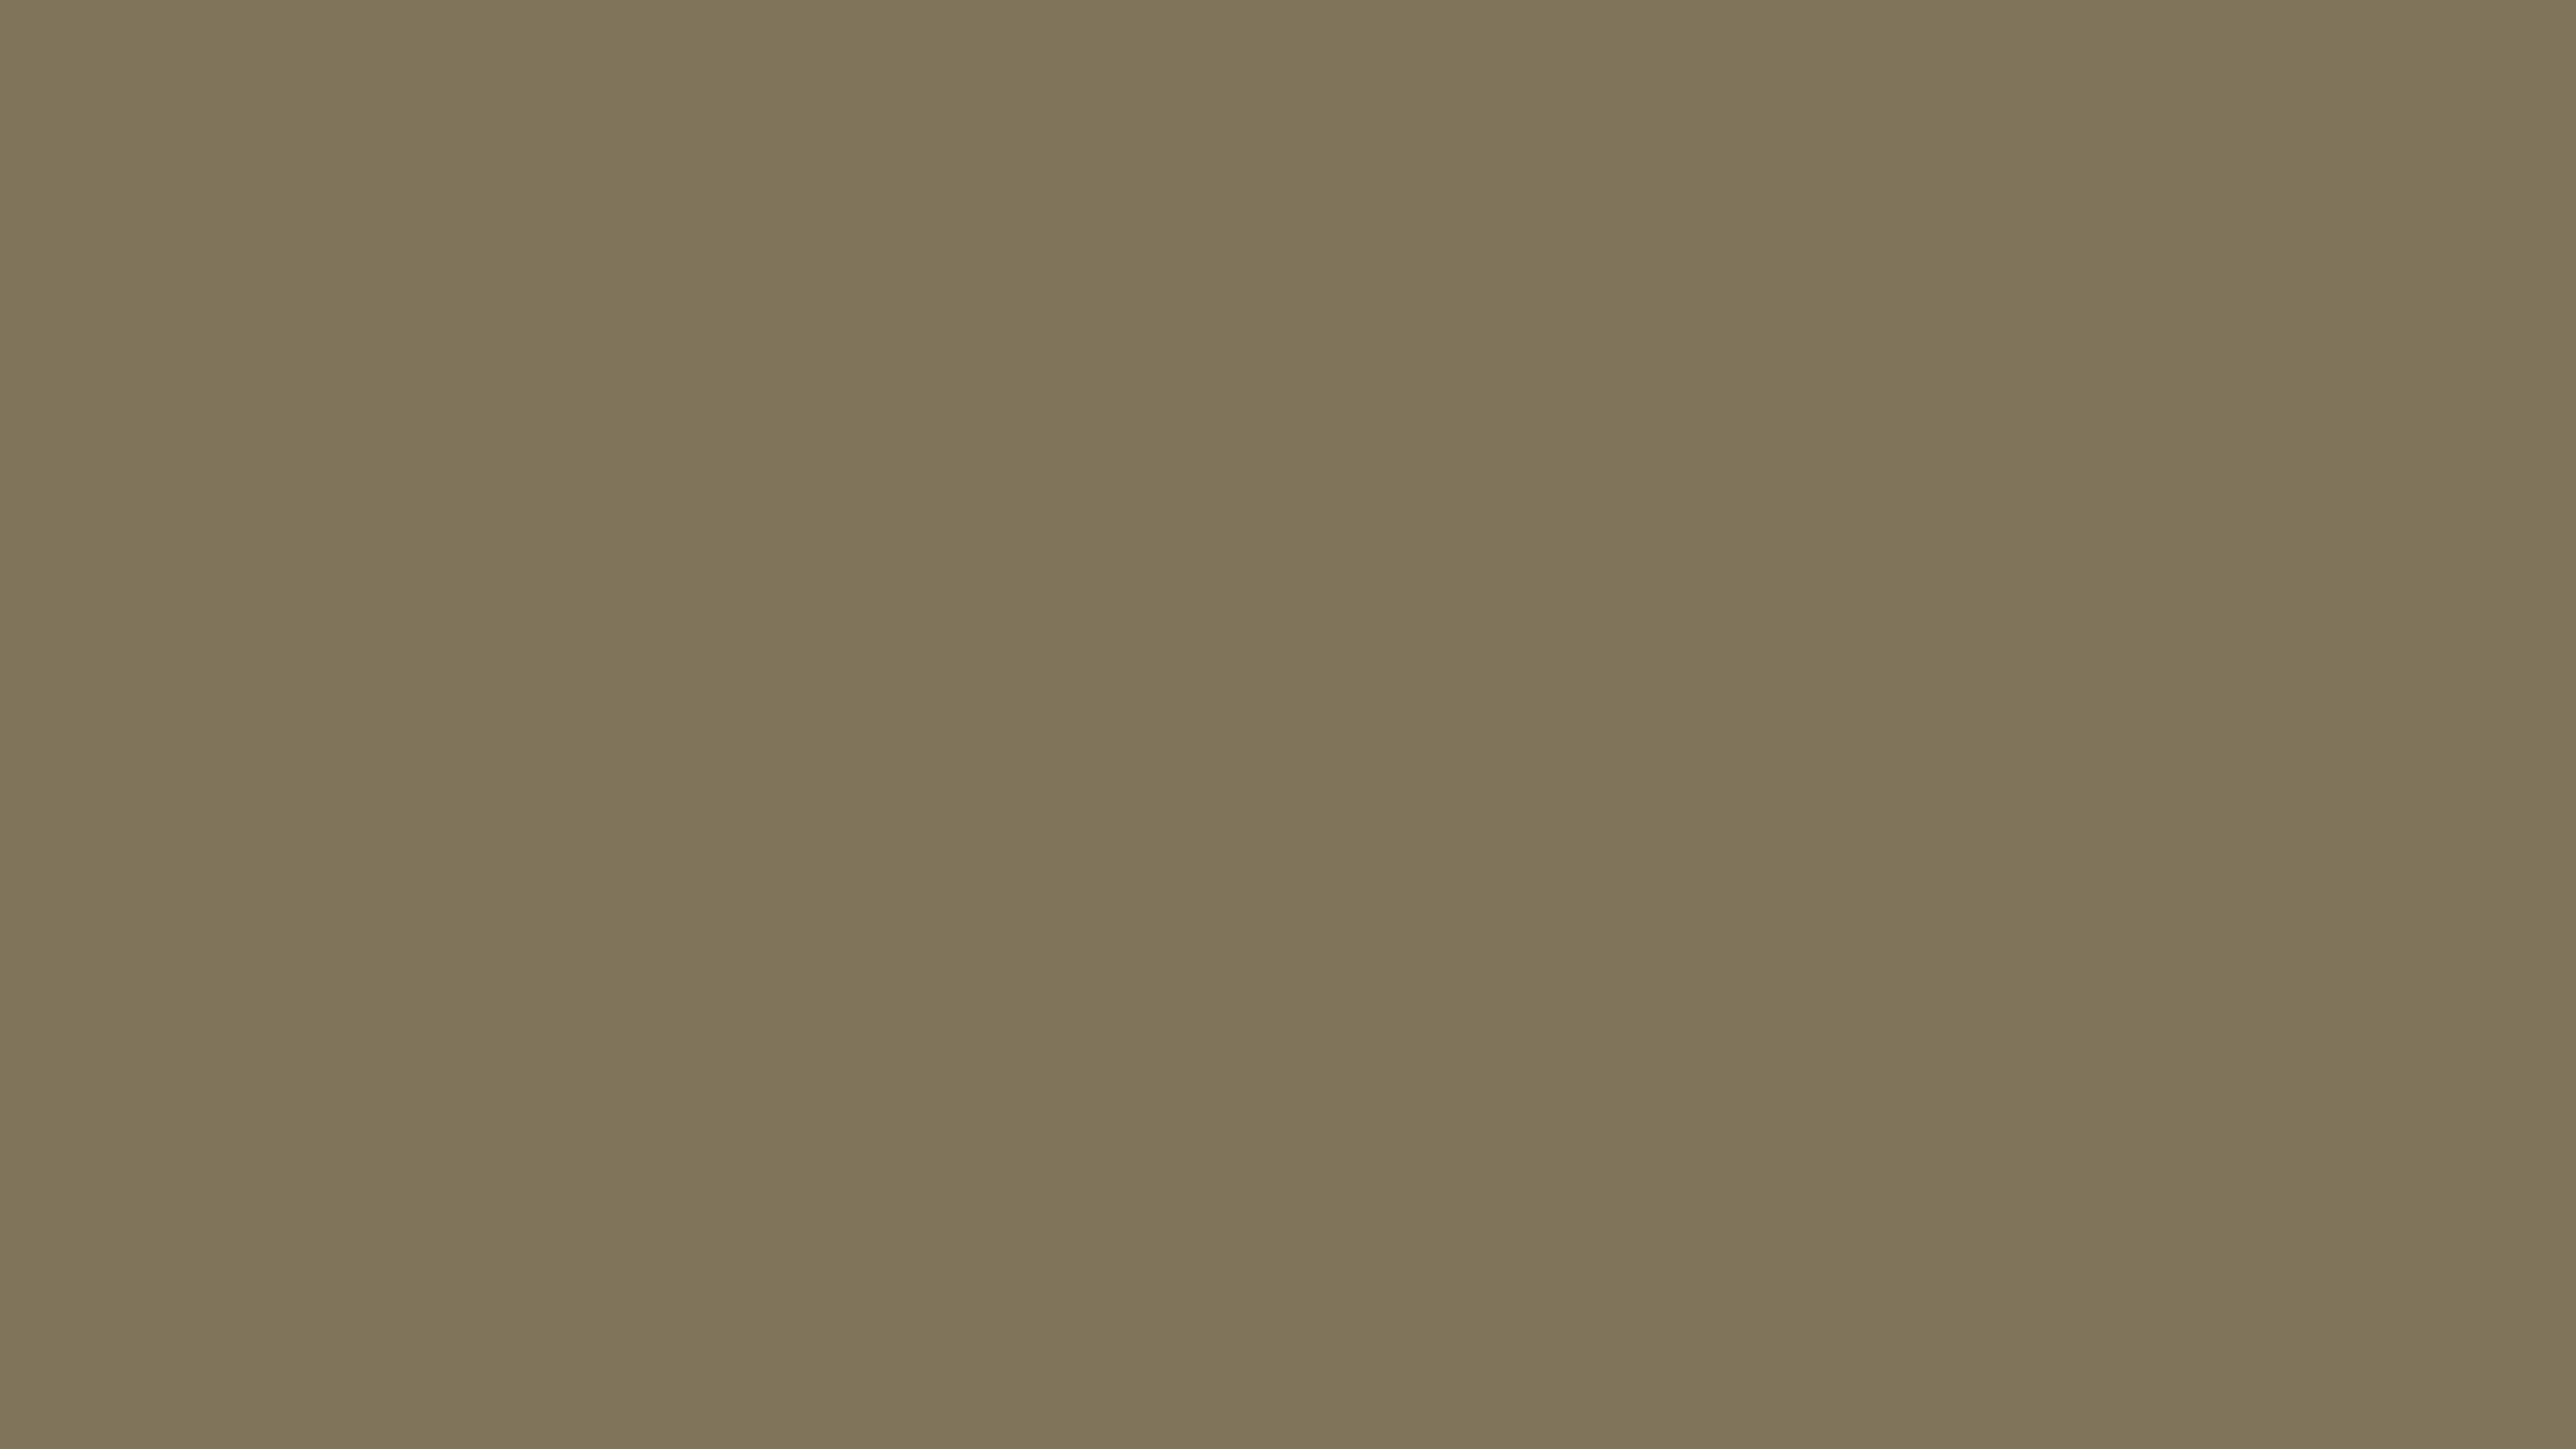 4096x2304 Spanish Bistre Solid Color Background